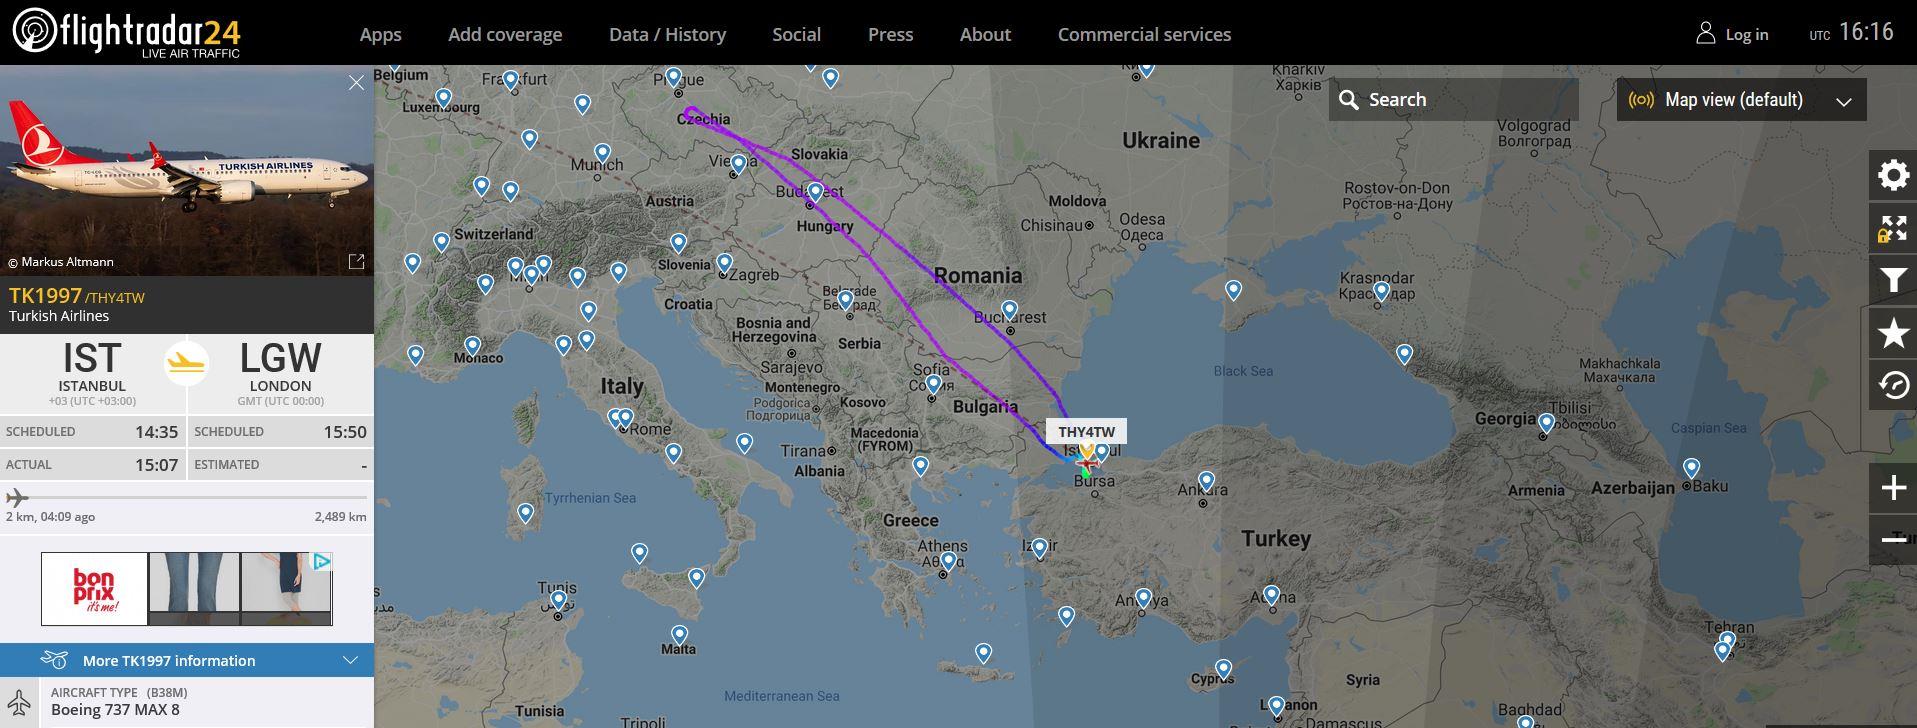 (c) flightradar24.com